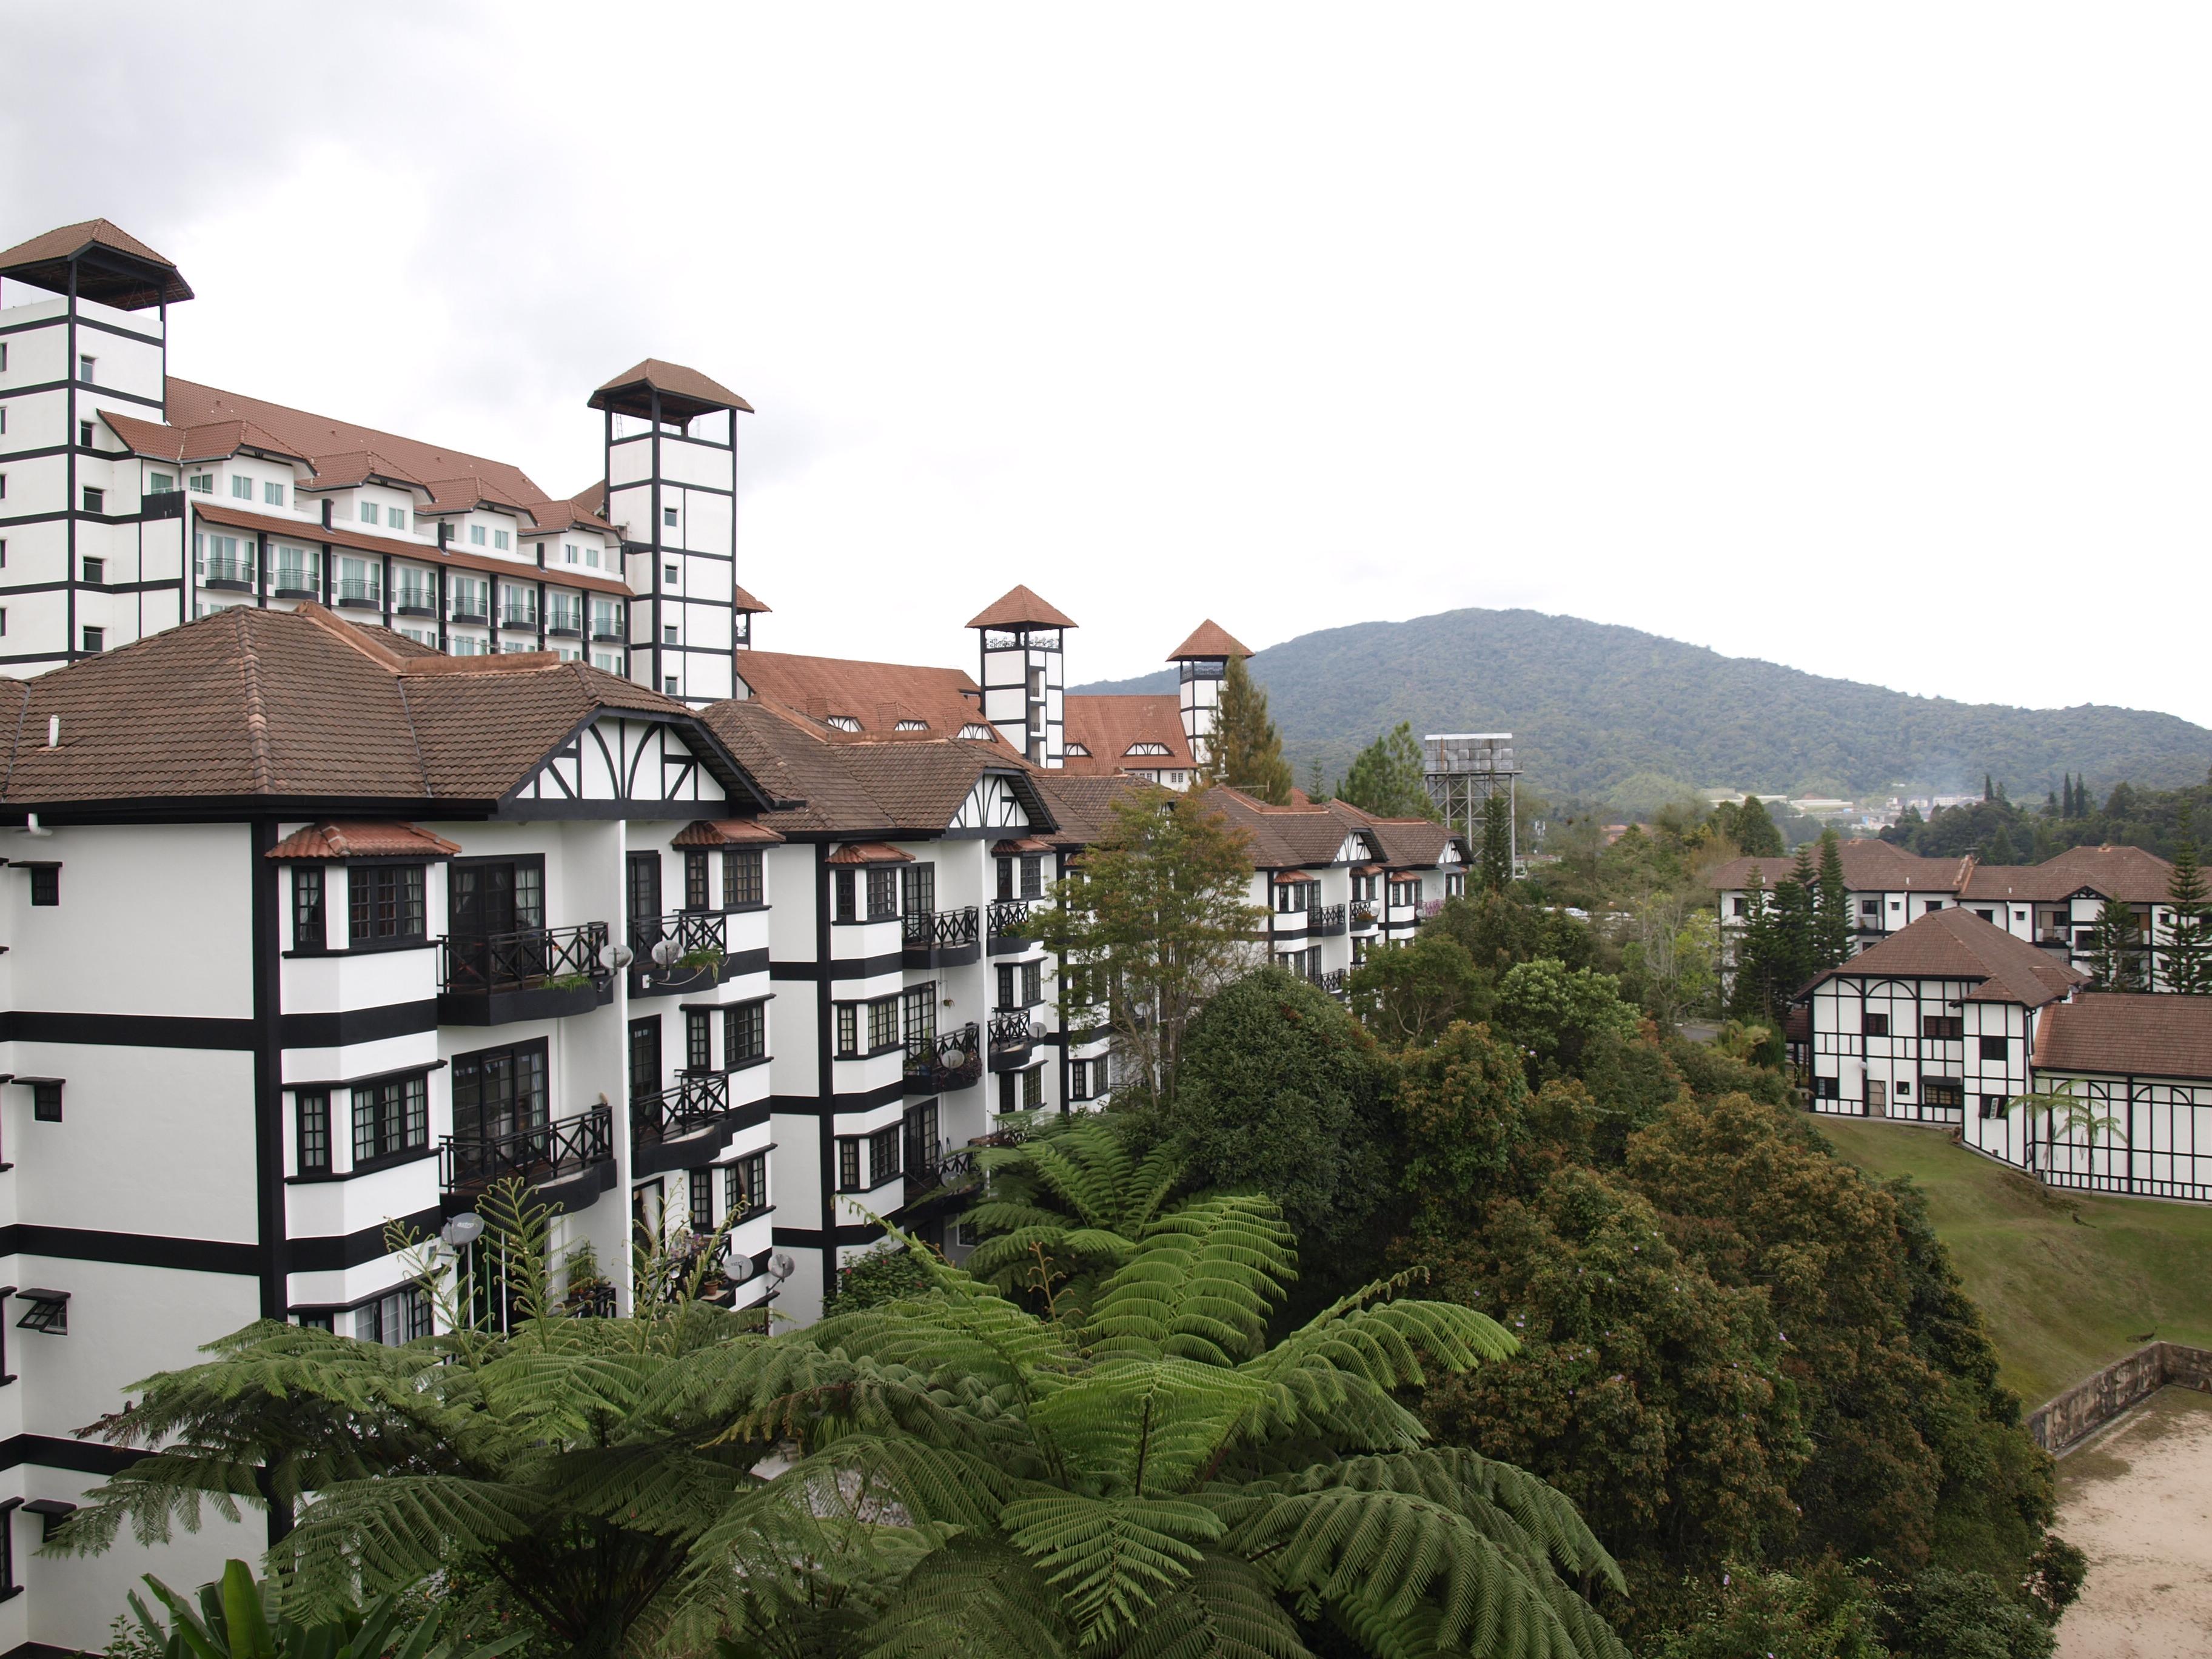 Greenhill Resort